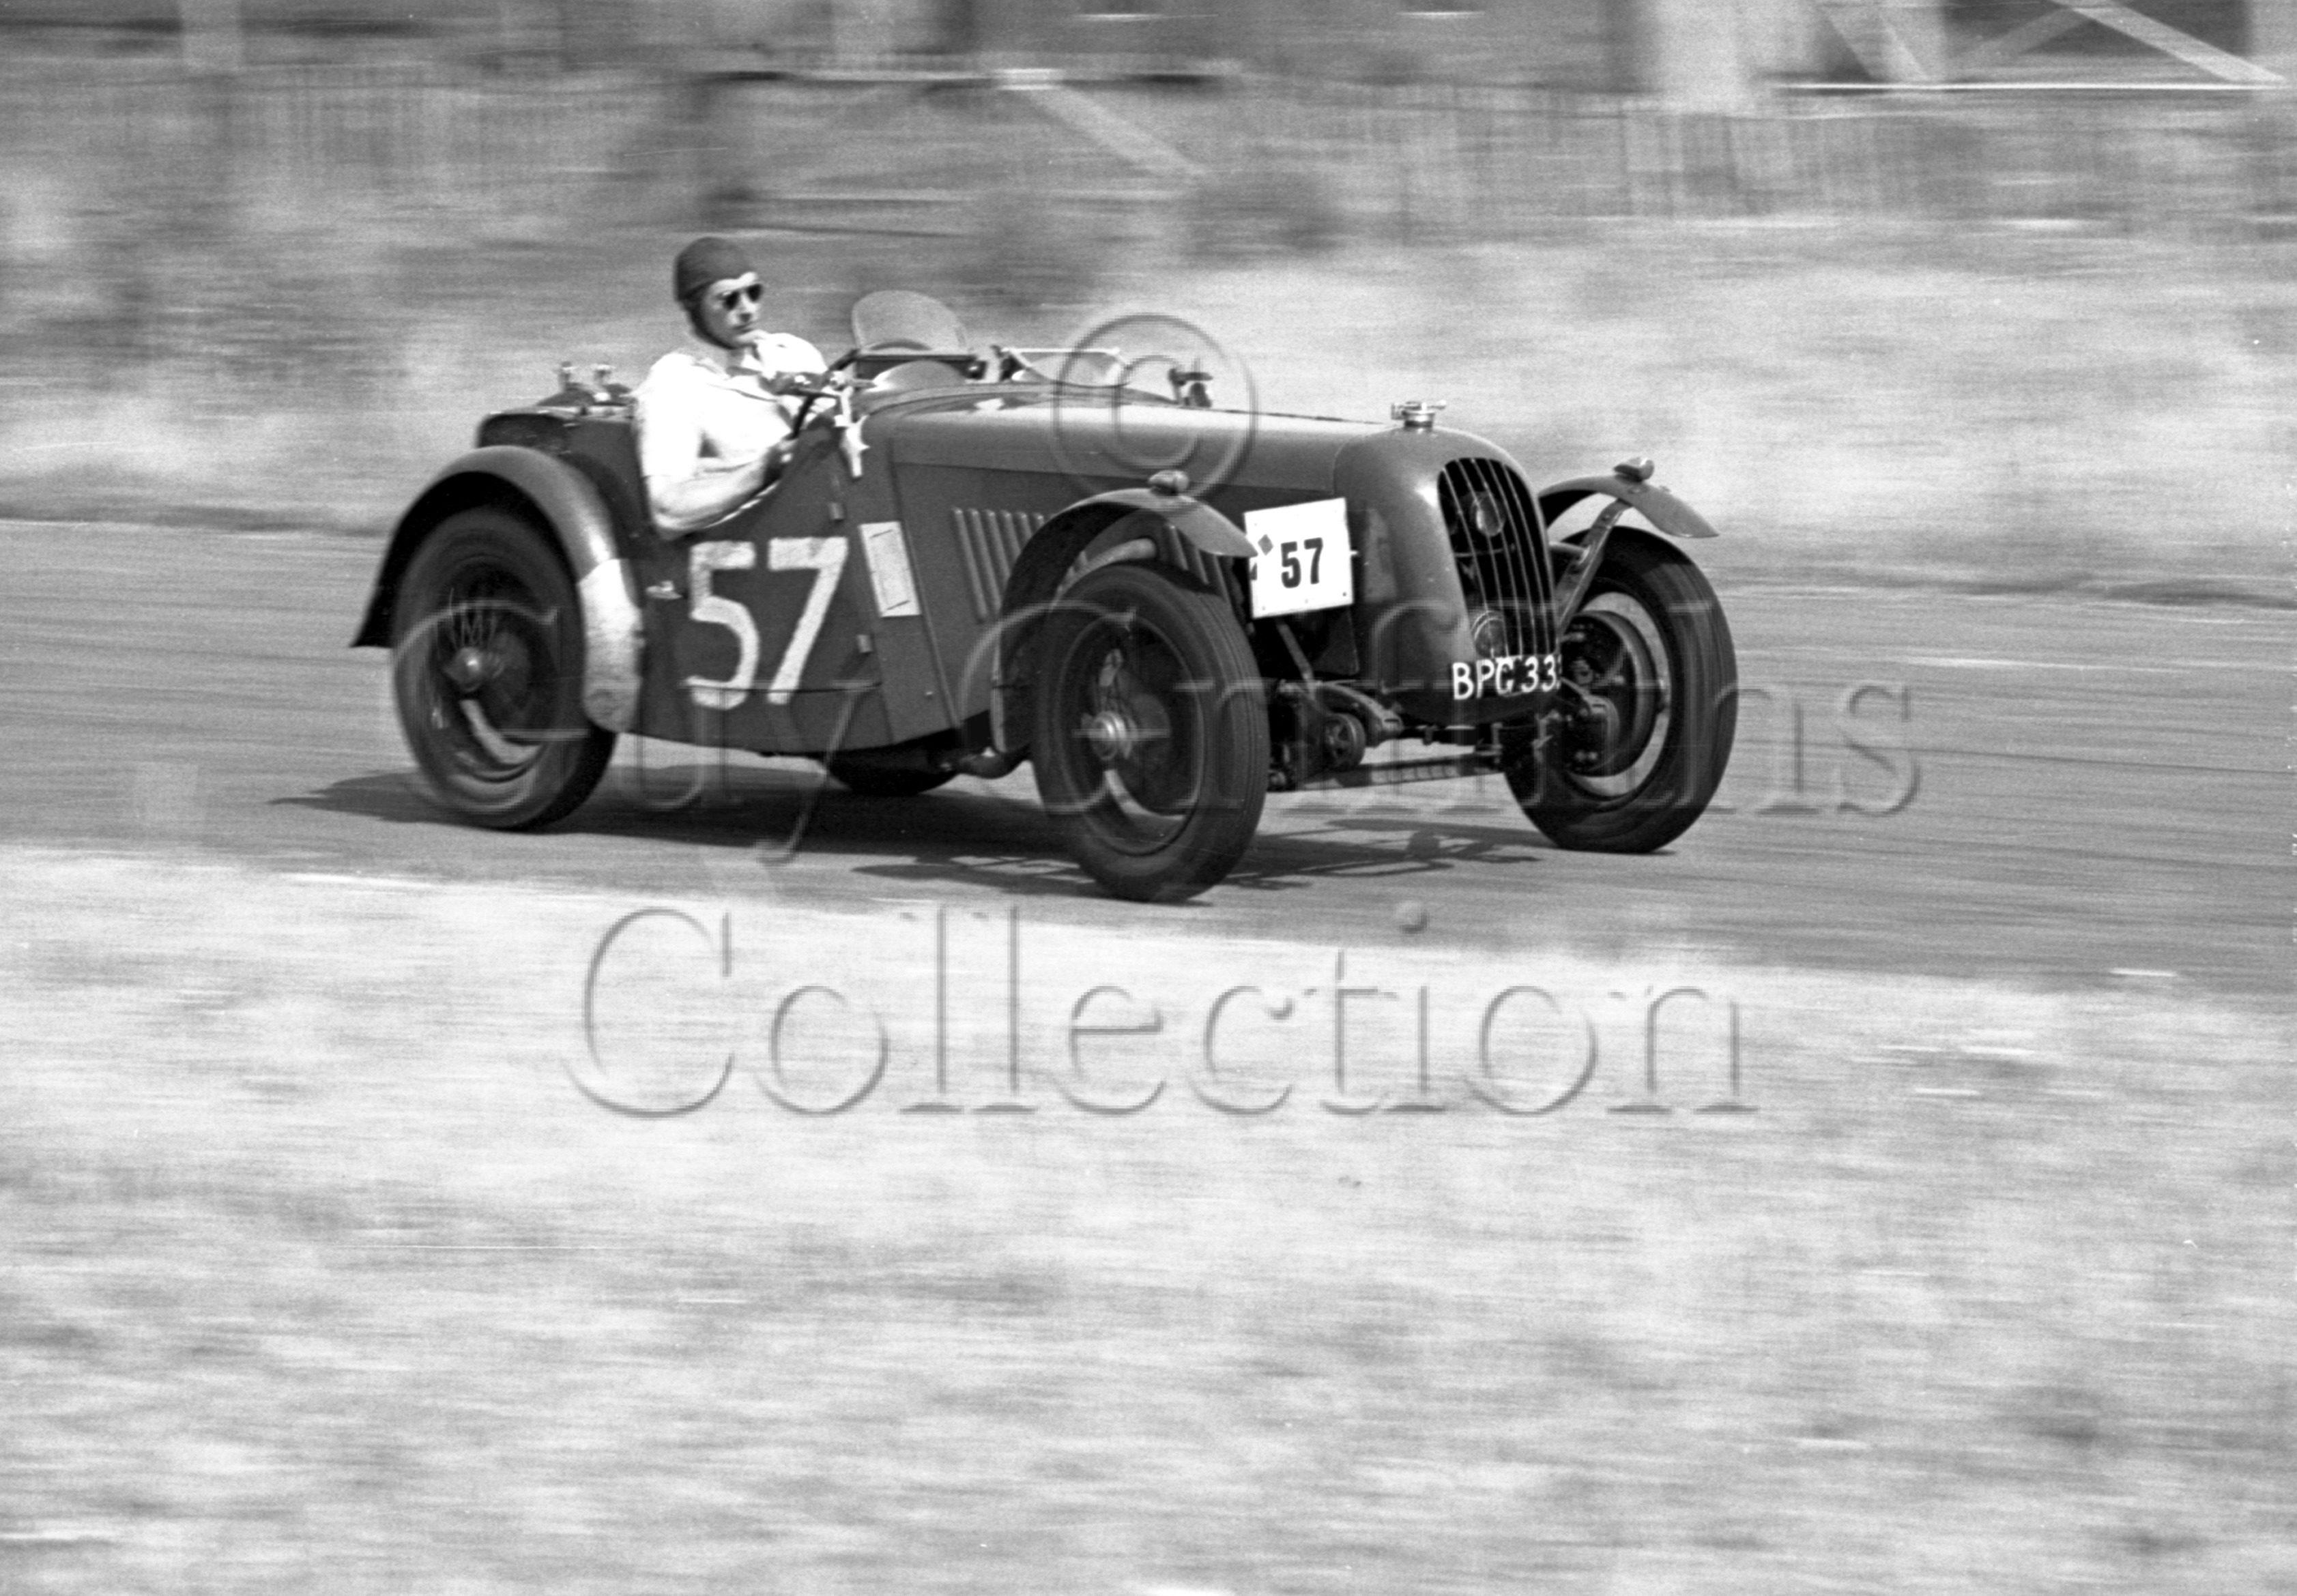 21-202–J-Tilling–Singer–Goodwood–13-08-1949.jpg - The Guy Griffiths Collection